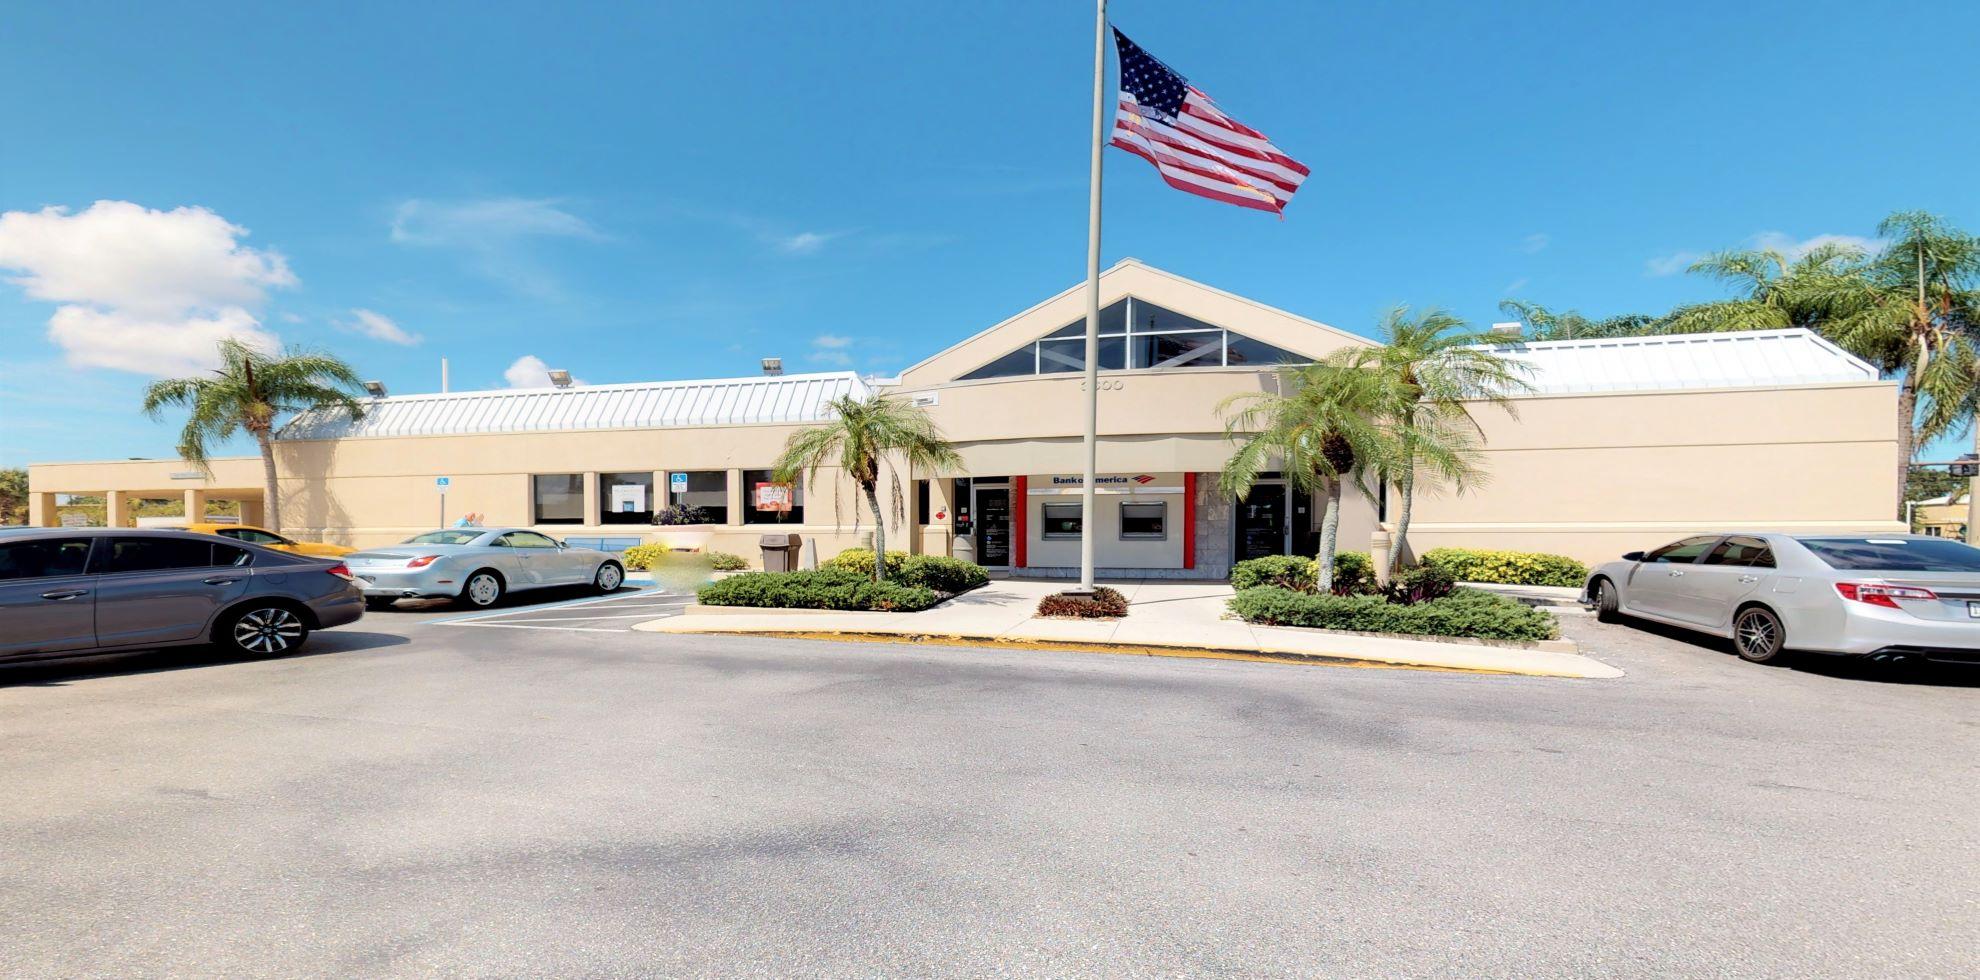 Bank of America financial center with walk-up ATM | 3600 Bee Ridge Rd, Sarasota, FL 34233